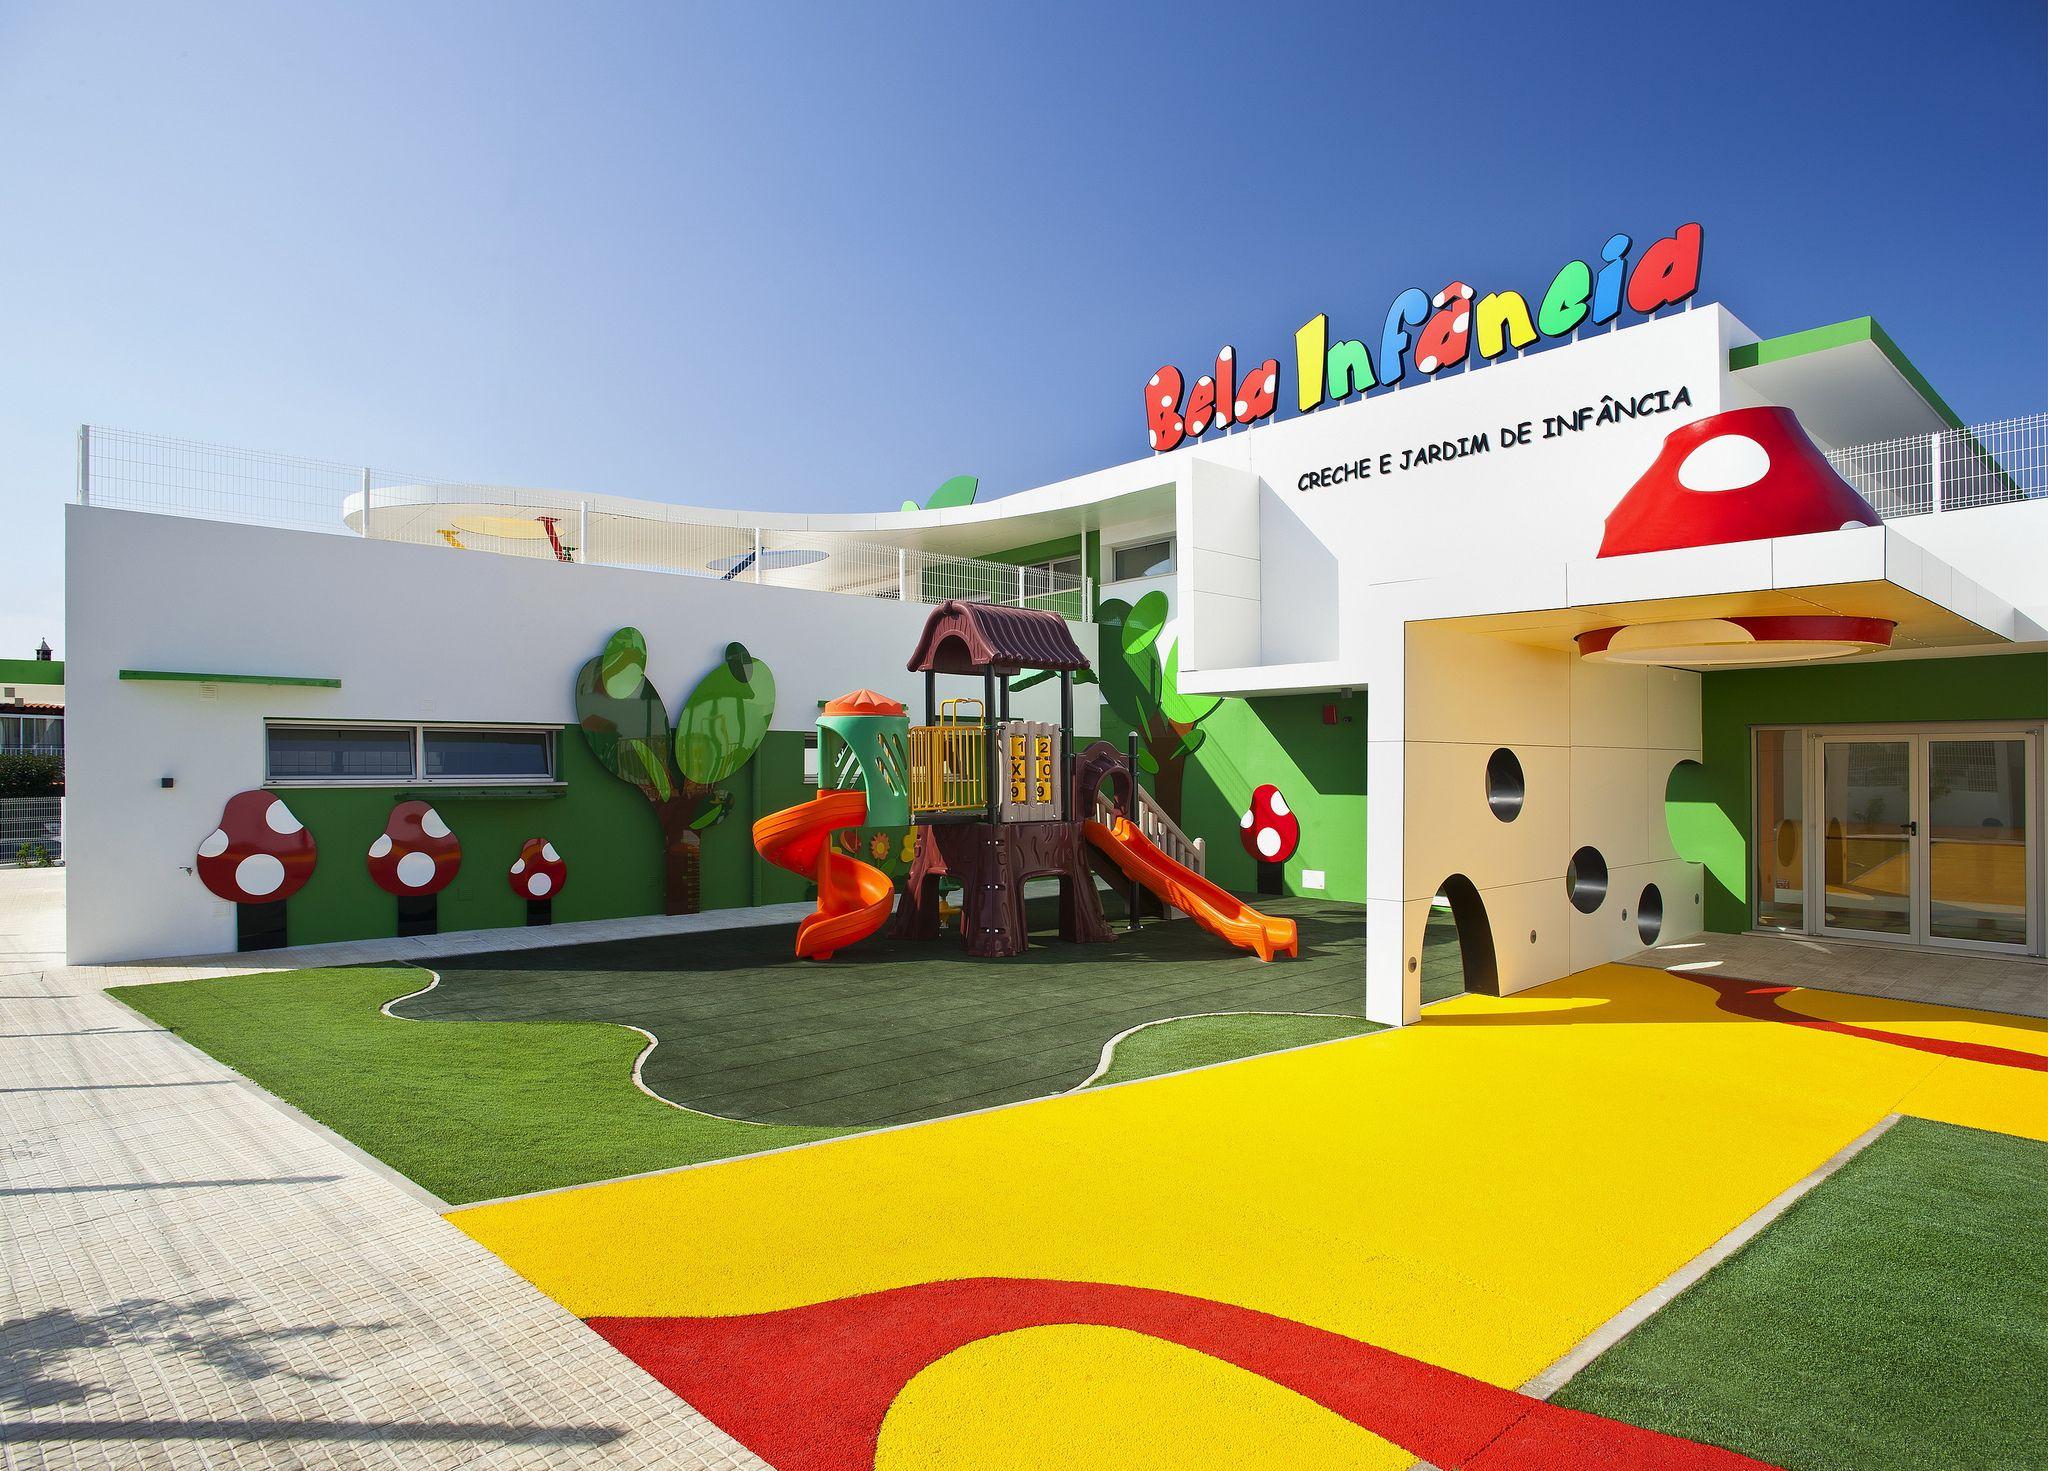 Creche bela infancia building group and originals - Interior design for school buildings ...